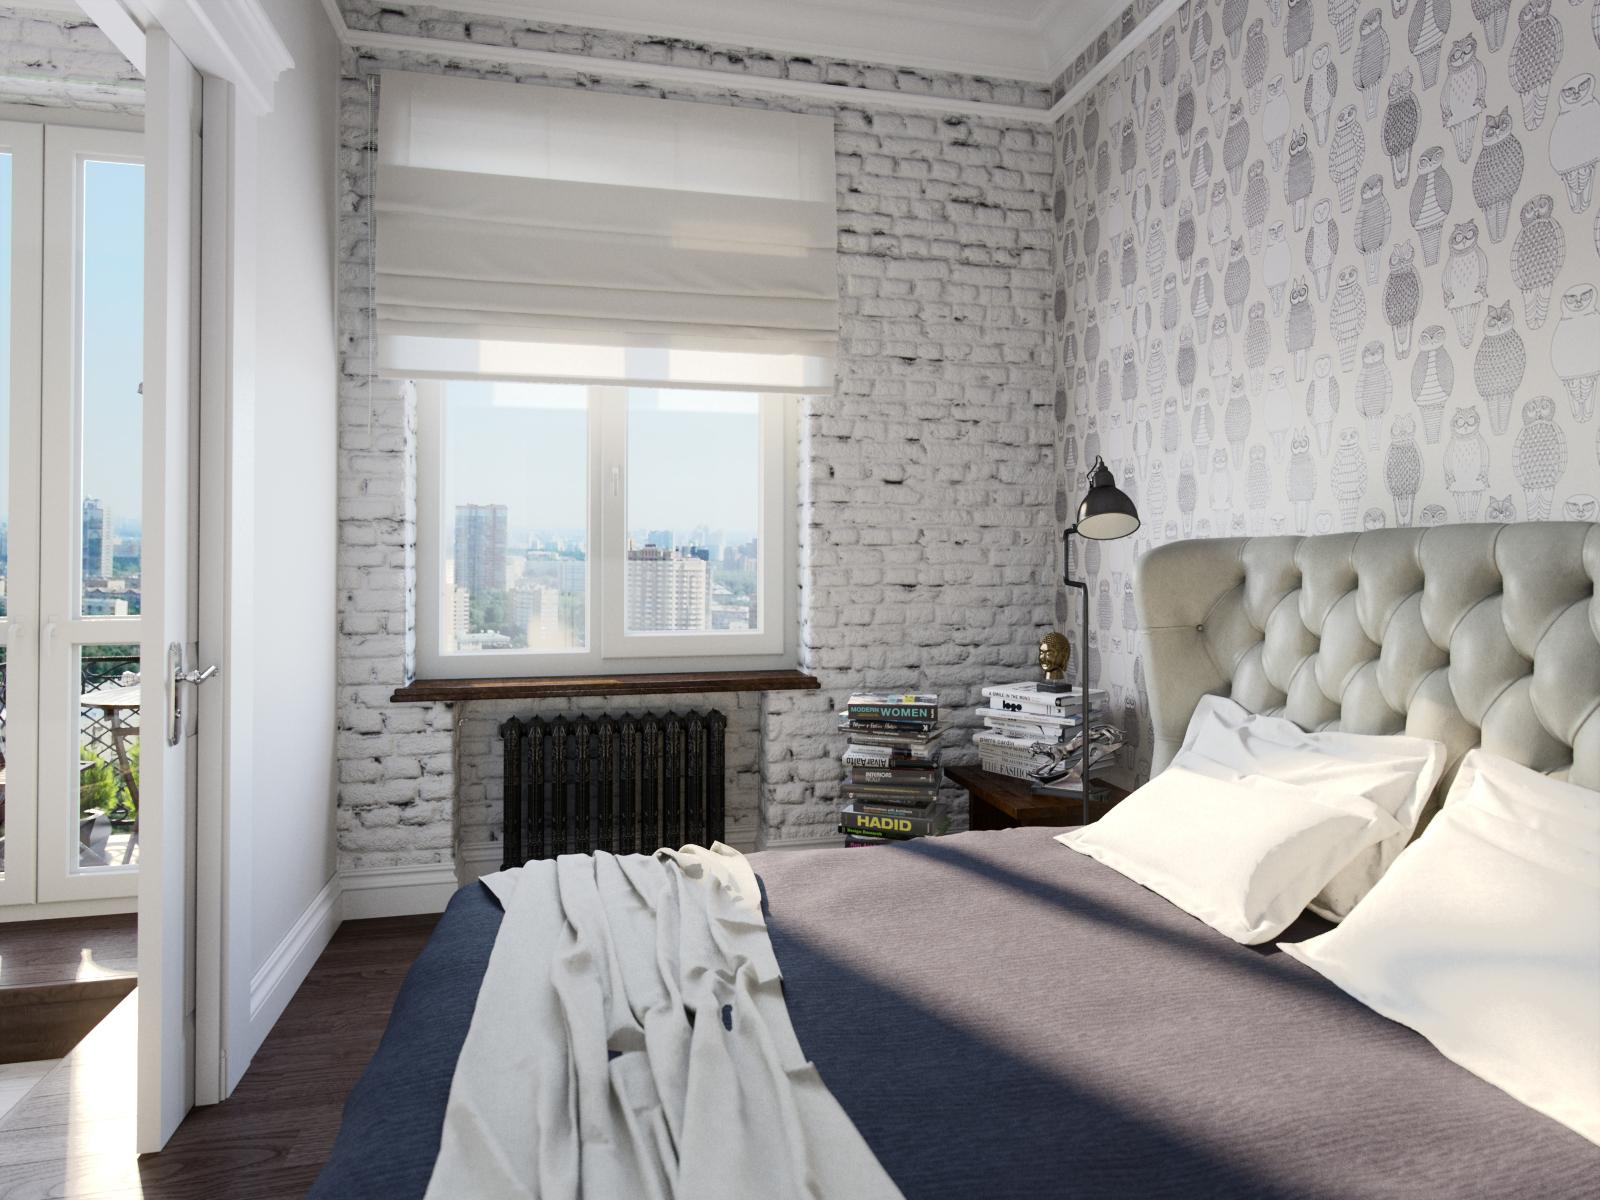 Стена в стиле лофт в спальне